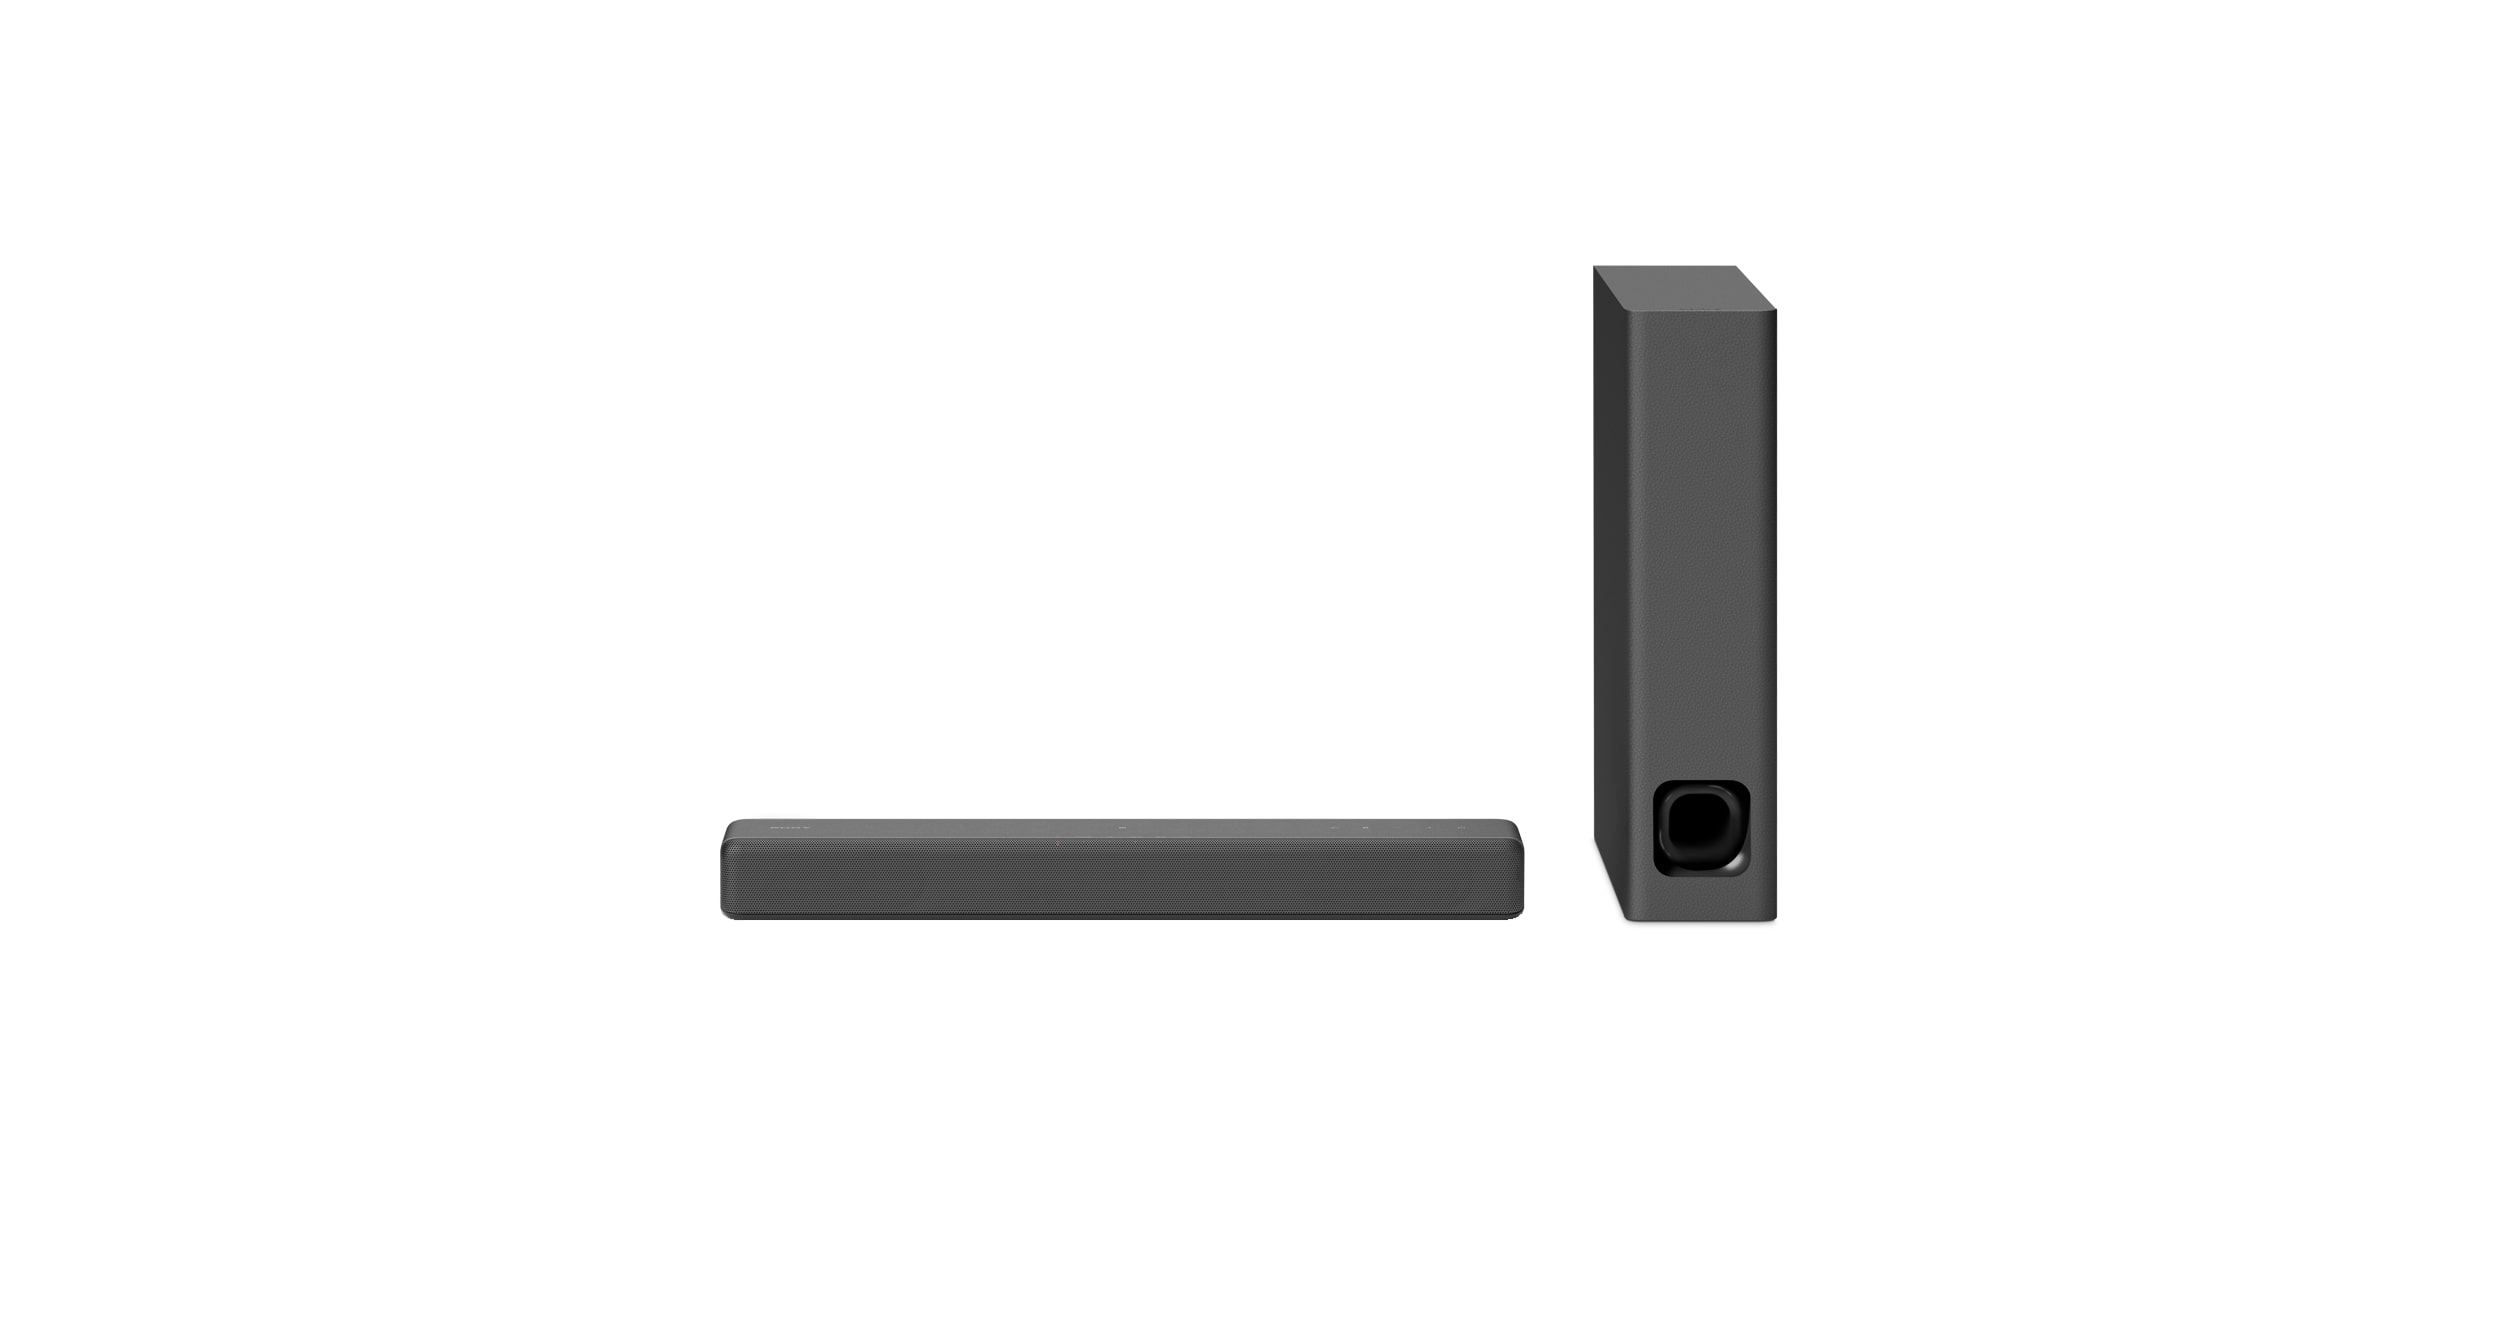 caract ristiques techniques du ht mt300 ht mt301 barres de son sony fr. Black Bedroom Furniture Sets. Home Design Ideas